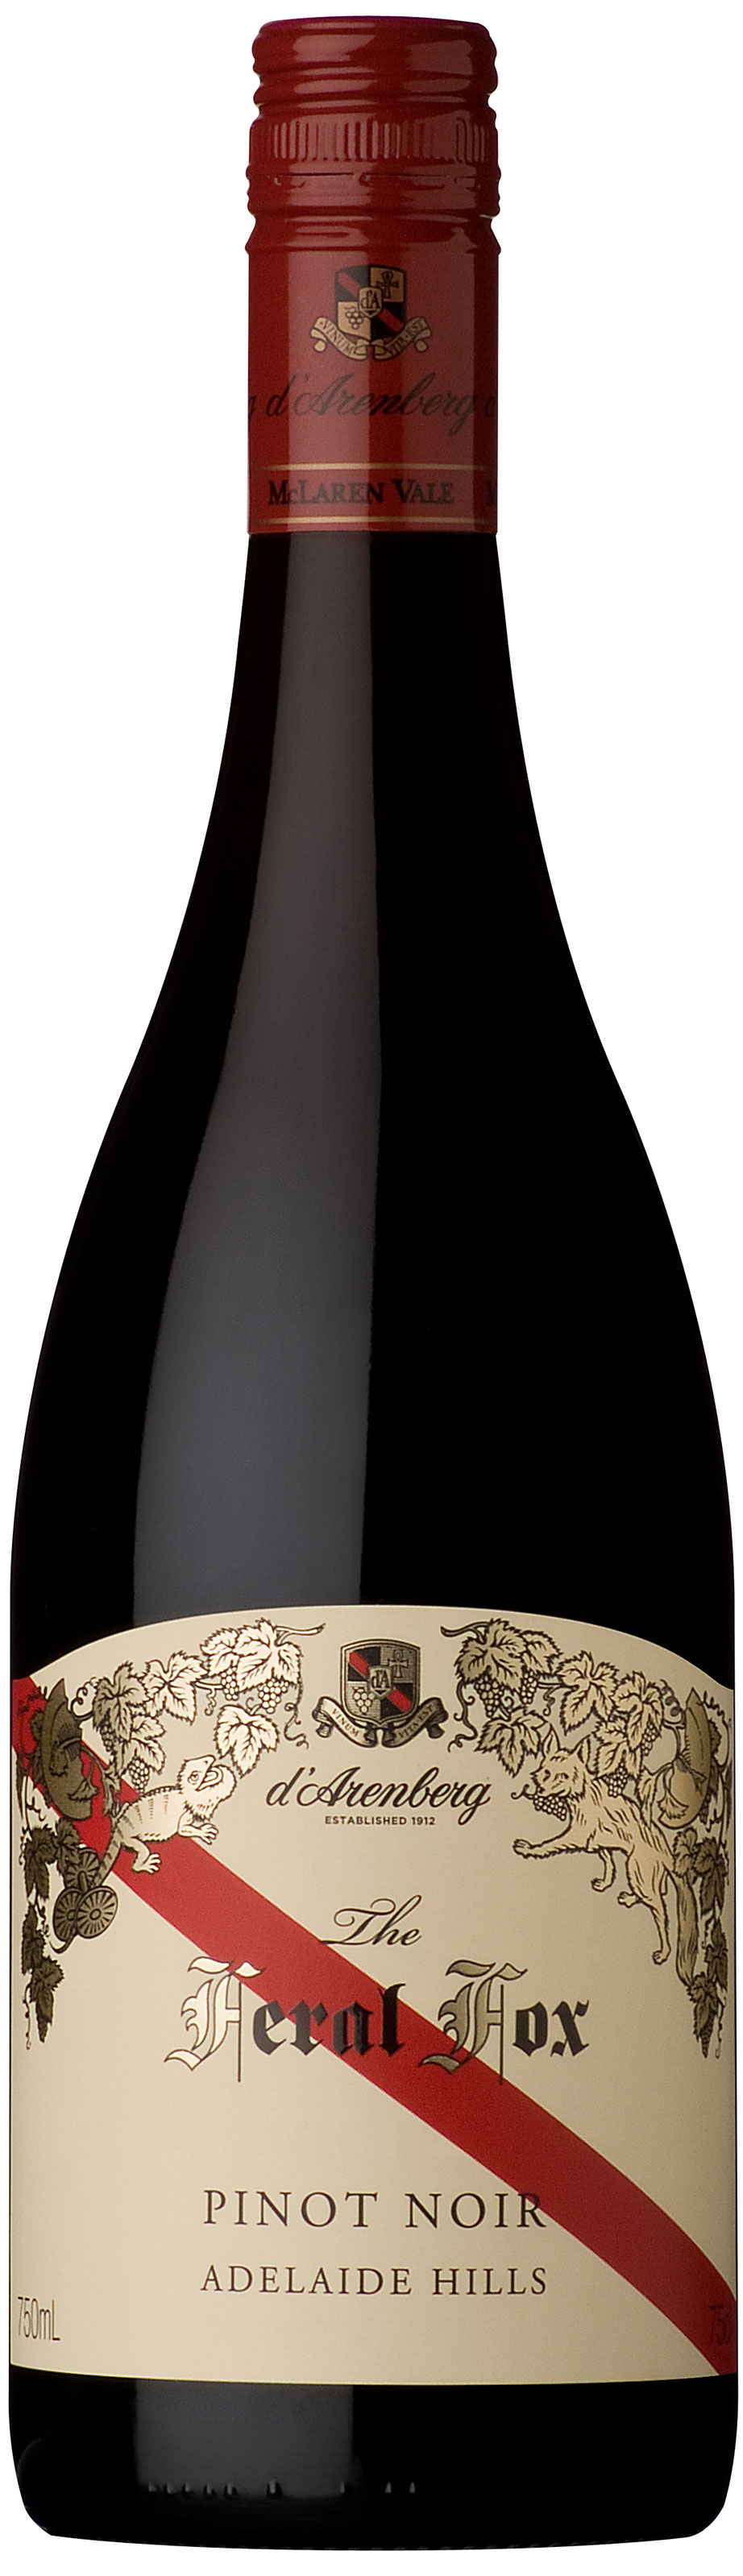 https://vinocorpperu.com/images/vinos/darenberg/the_feral_fox_pinot_noir_2015.jpg